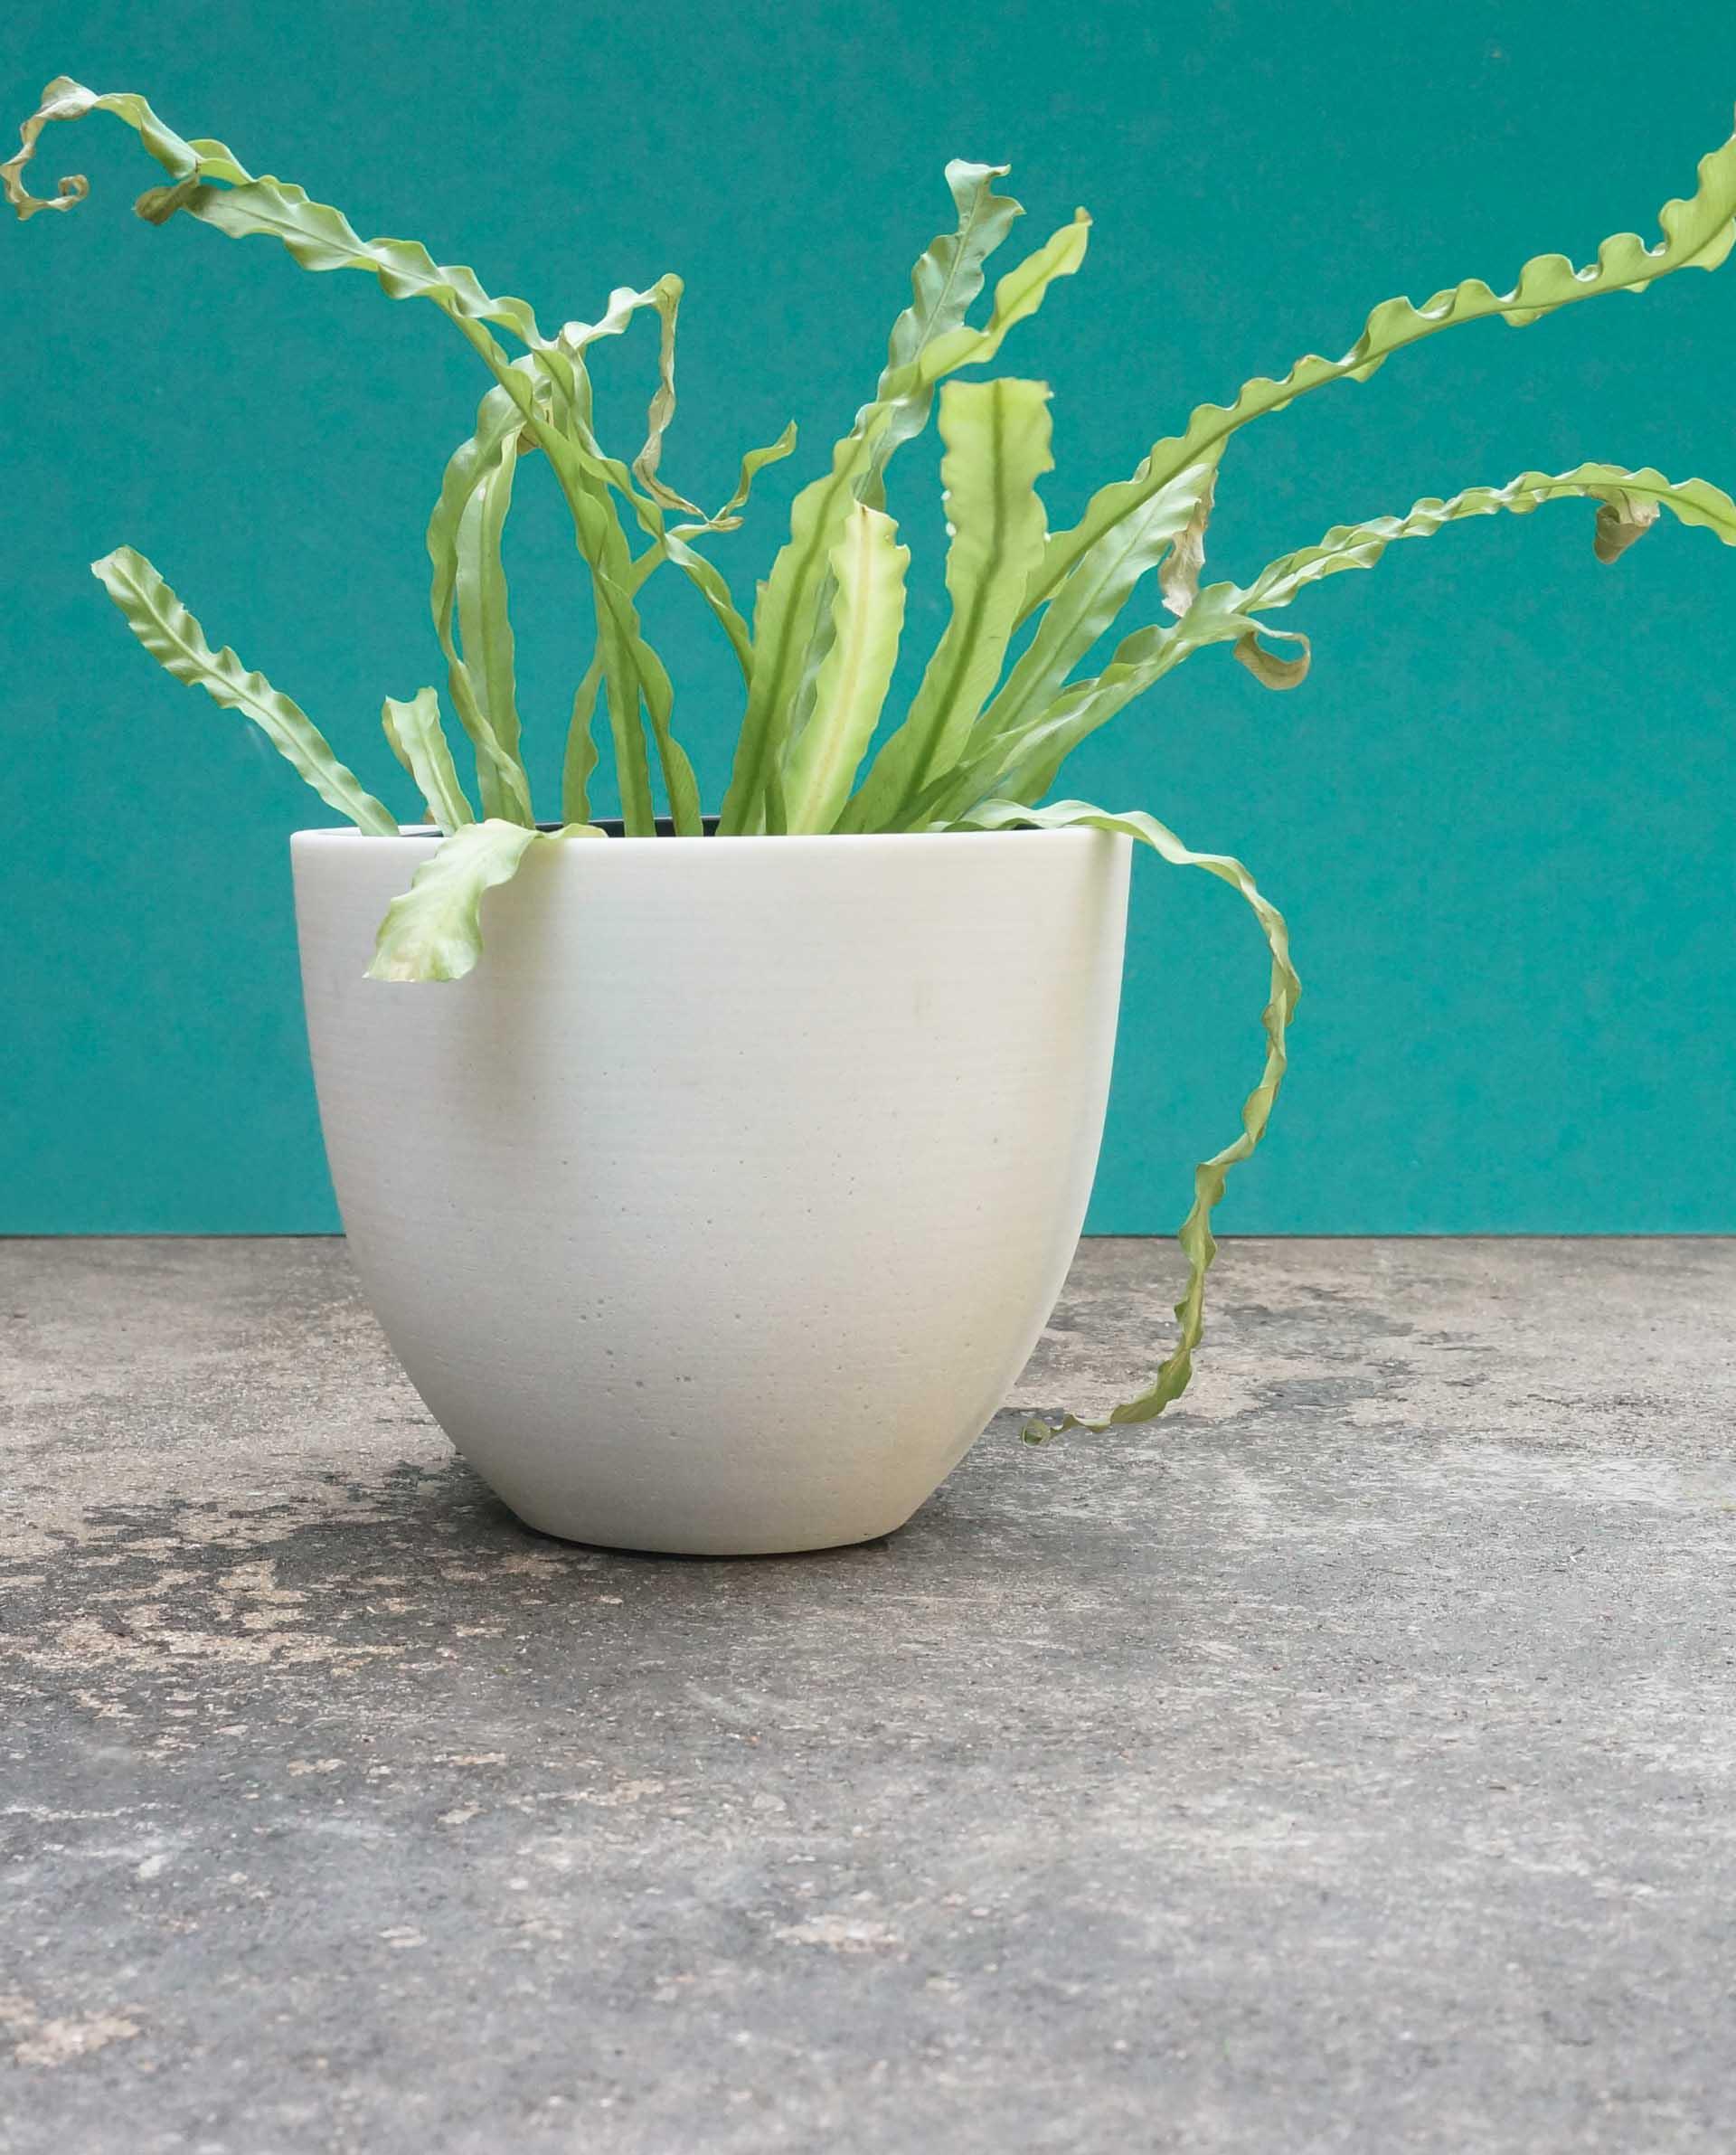 Birds-nest-fern-houseplant